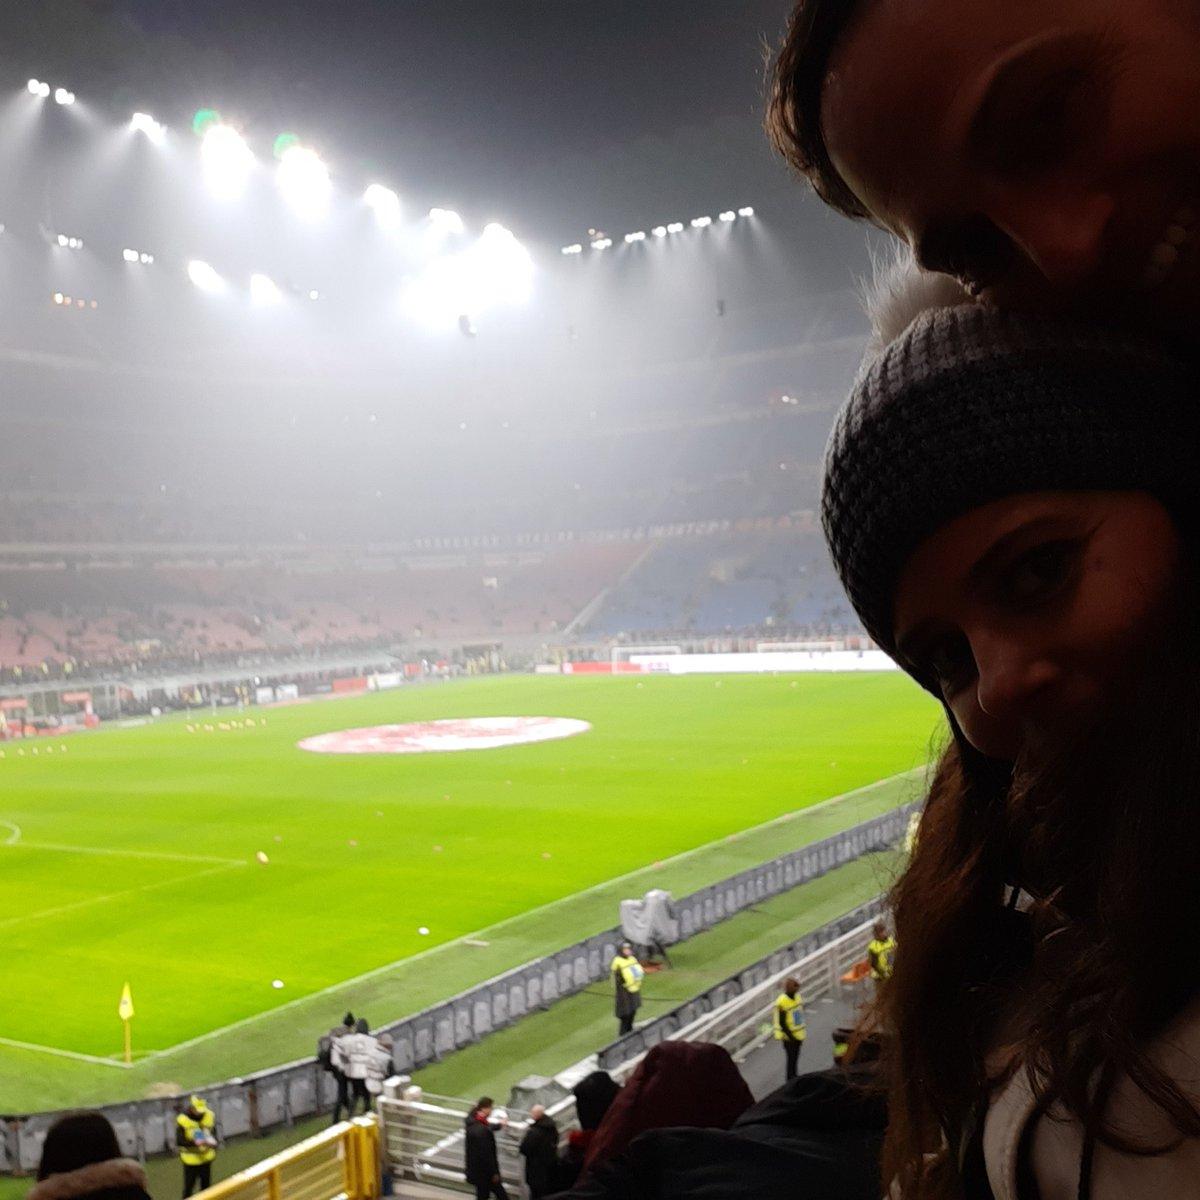 #MilanTorino #soccer #football #SanSiro #Milan #stadium #sporty #sportygirl #entertainment #sport #screenwriter #screenwriterslife #love #truelove #acmilan #weareacmilan #visitmilano #yesmilano #Milano #monday #mondaynight pic.twitter.com/DNiDxqrHg9